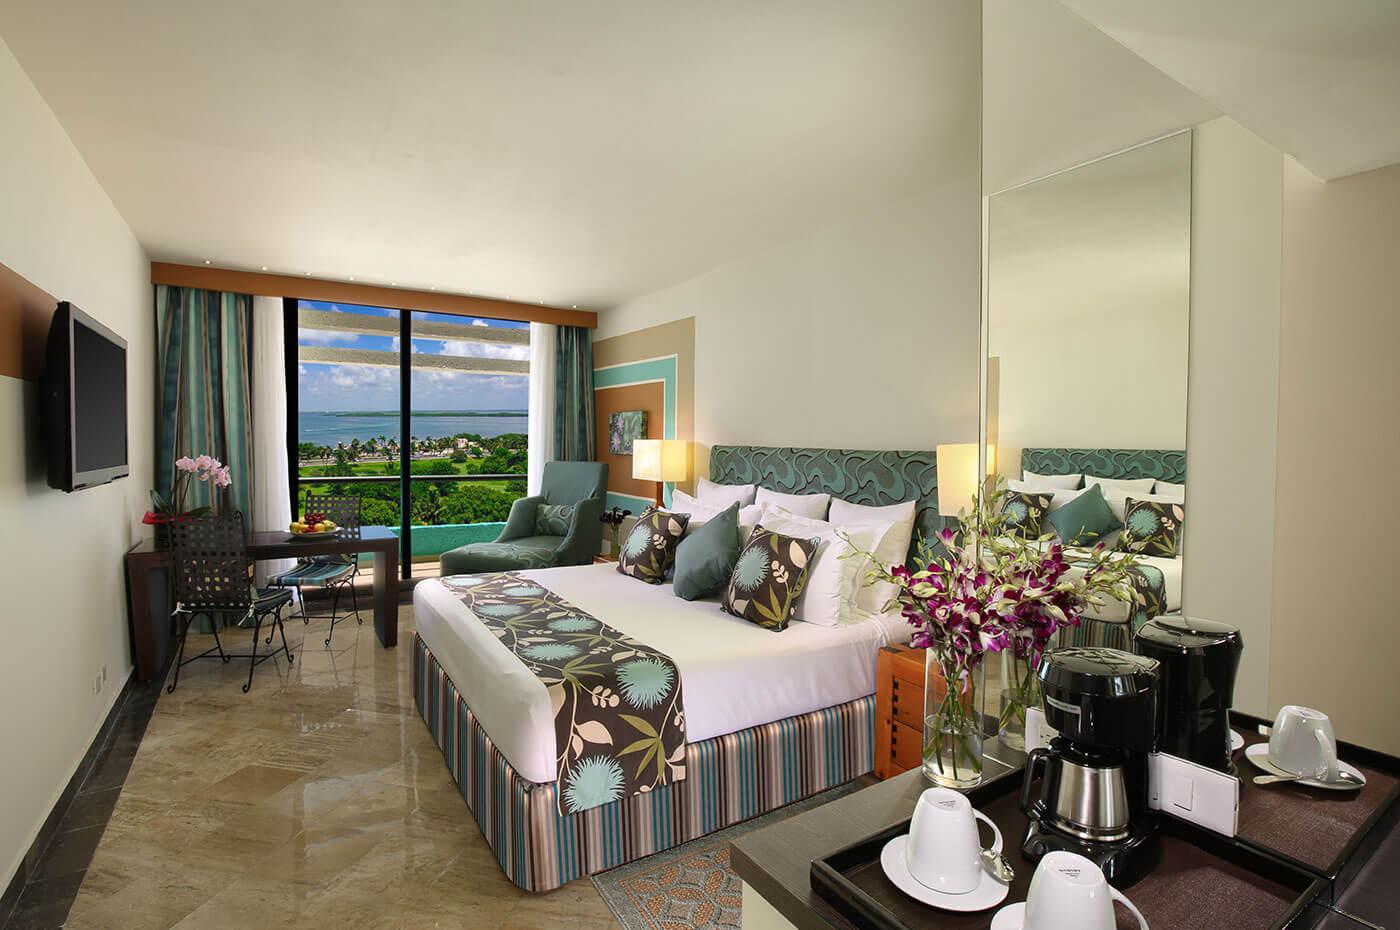 Sample image of Lagoon View room